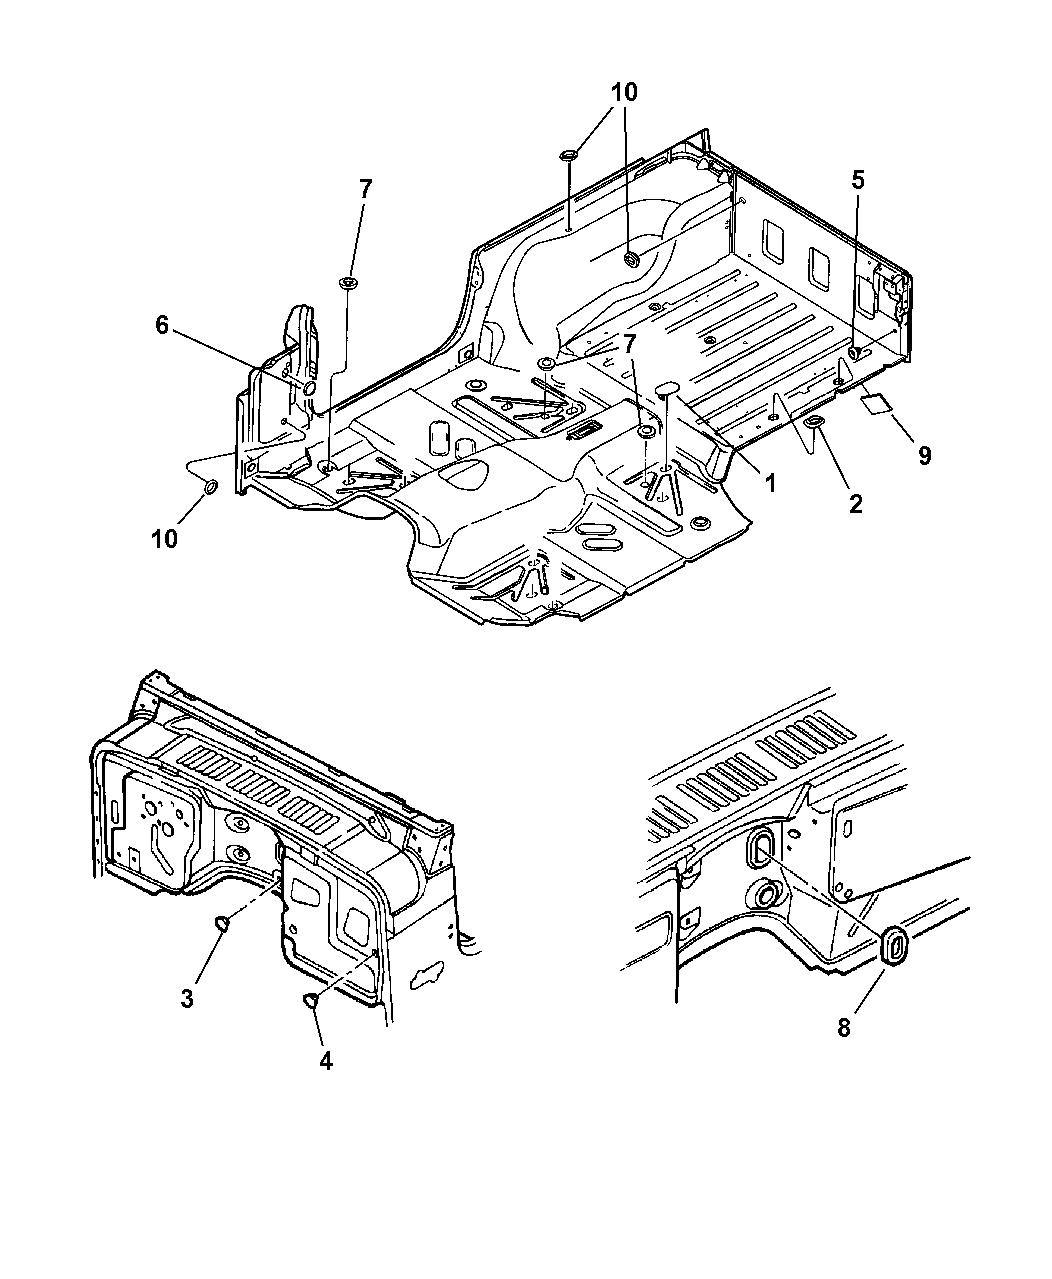 Jeep Wrangler Plugs